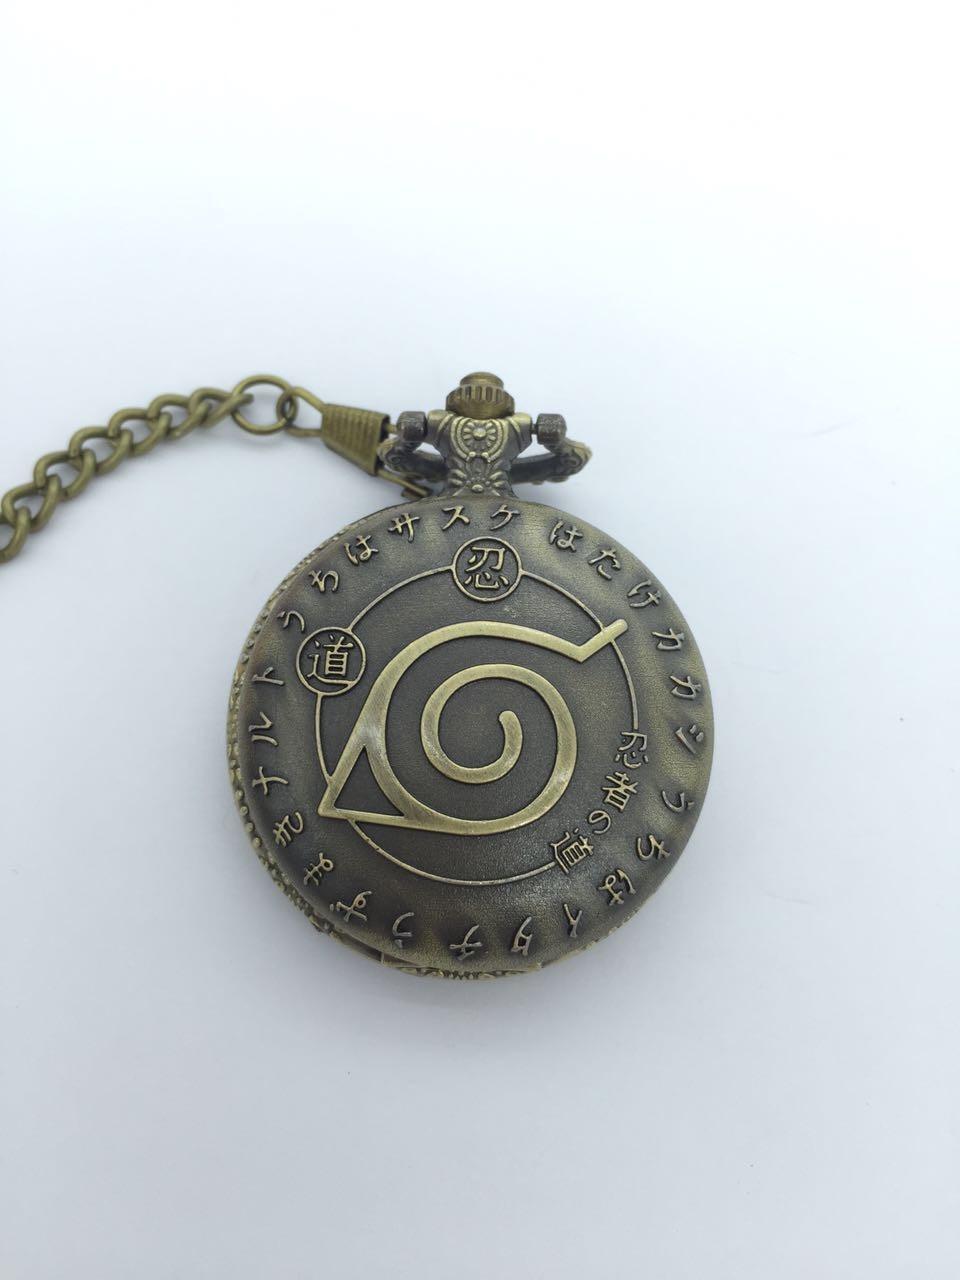 New Bronze Antiques Shinobi Flip Clock Mens Good Quality Steampunk Pocket Watches Gift PO5878